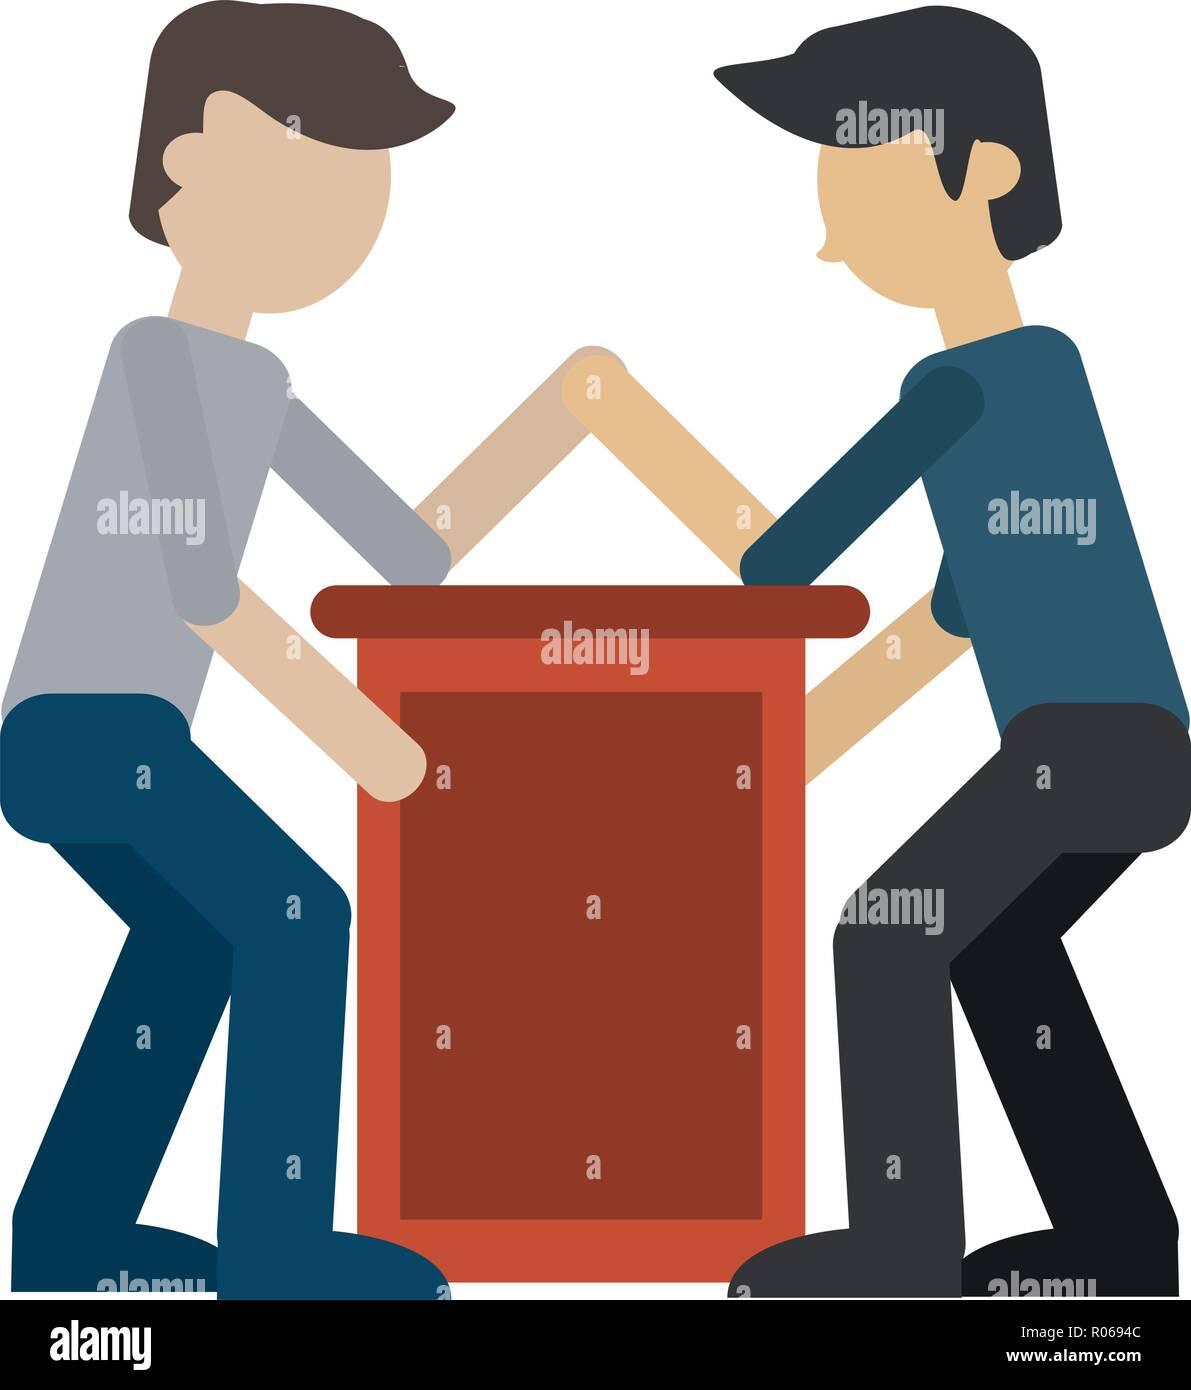 Arm wrestling men avatar vector illustration graphic design - Stock Image